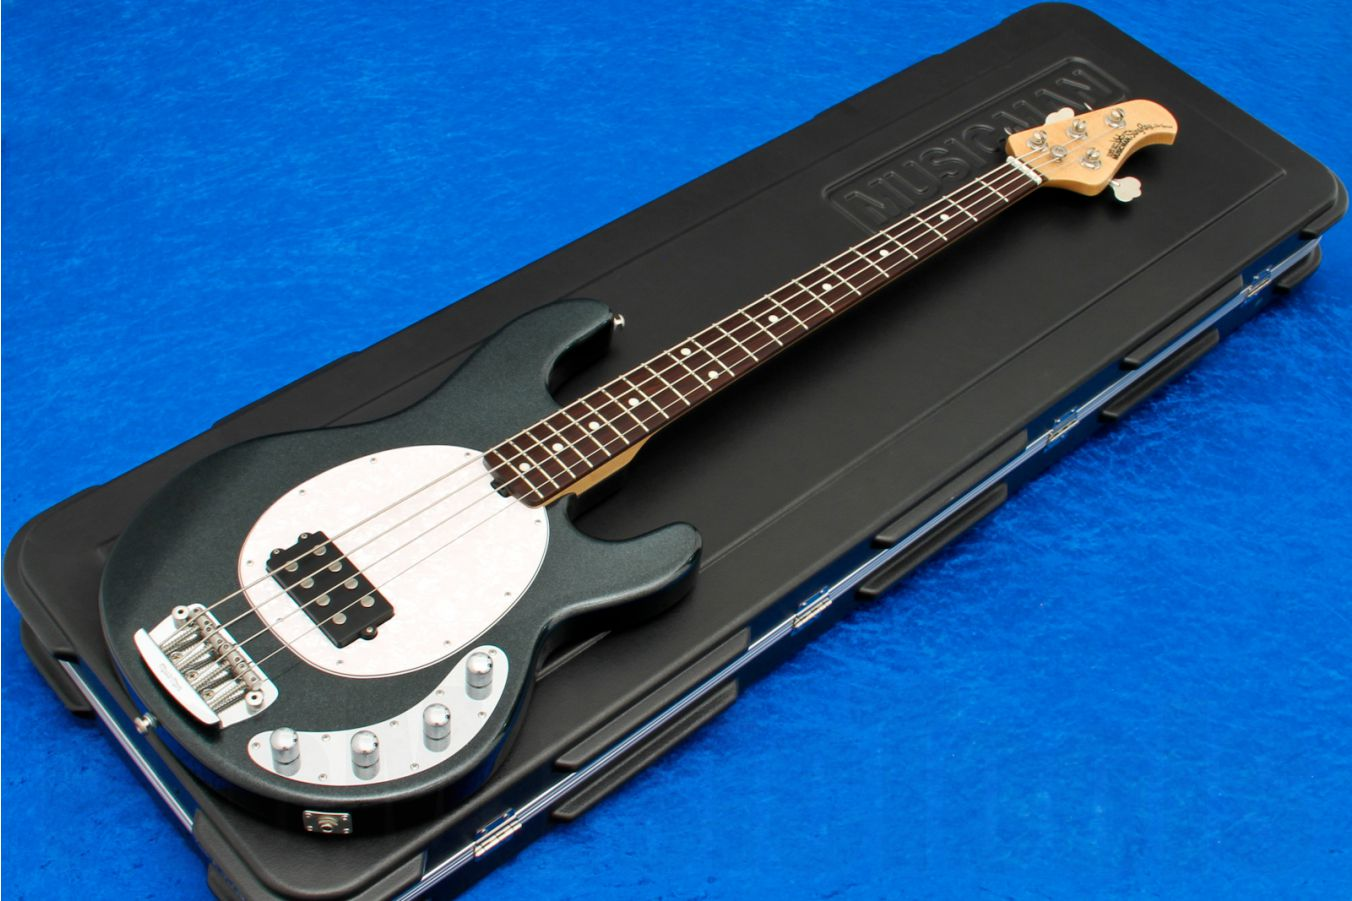 Music Man USA Stingray 4 SLO Special BMC - Black Magic Crystal RW Limited Edition